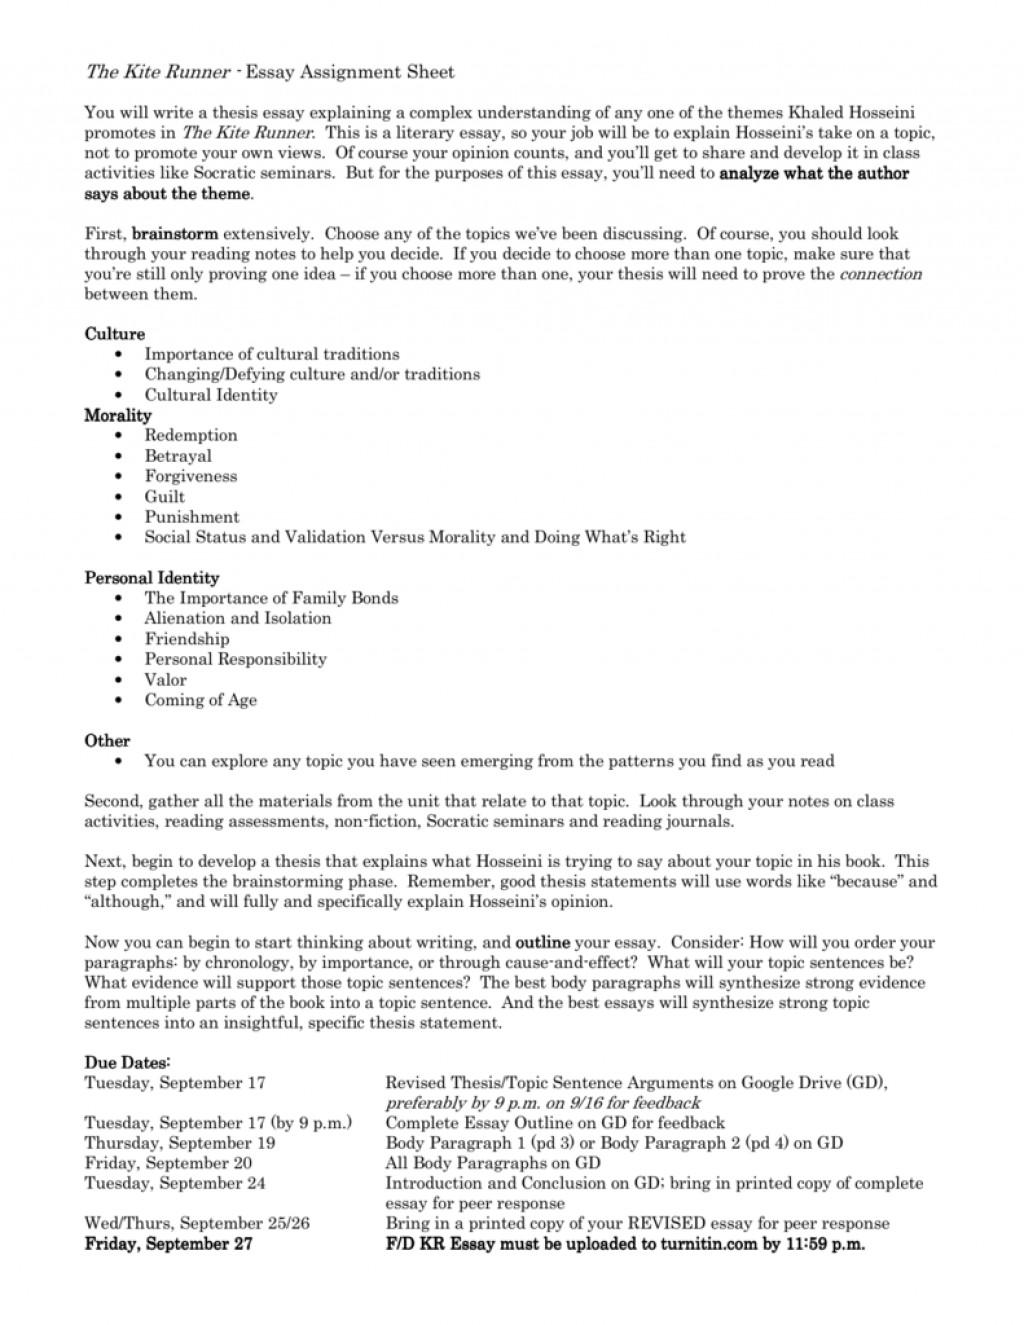 008 Age Of Responsibility Essay Example 008368919 1 Awful Persuasive Argumentative Criminal Large